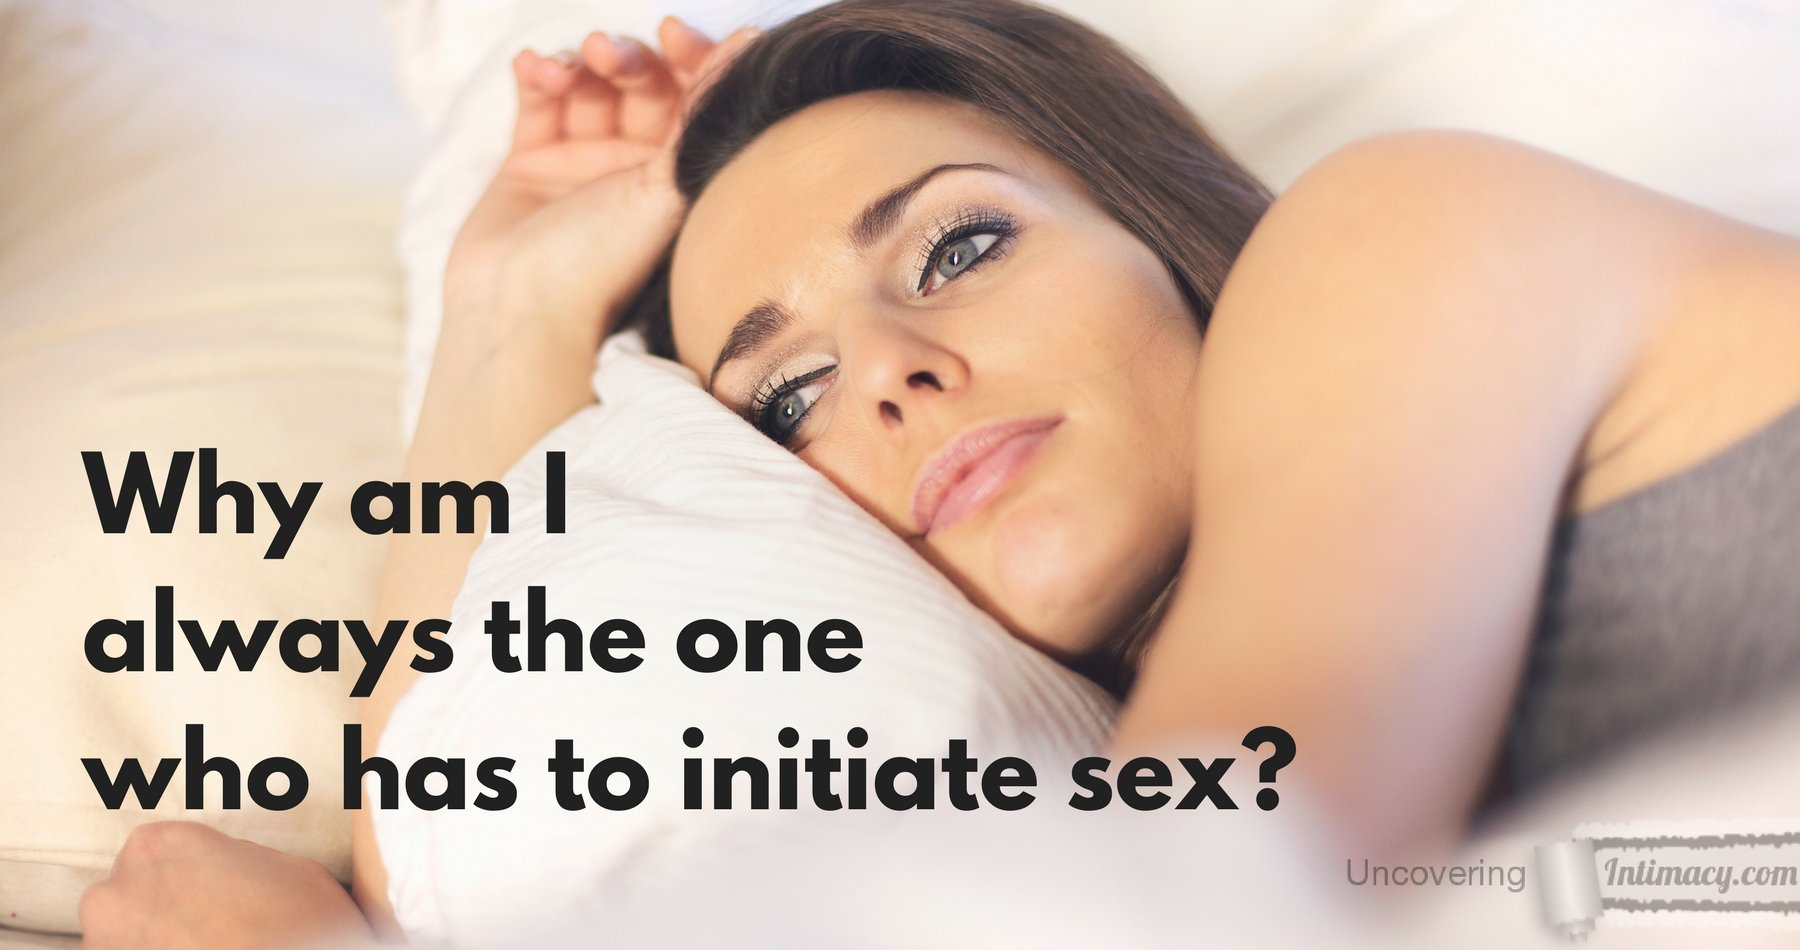 My boyfriend never initiates sex anymore